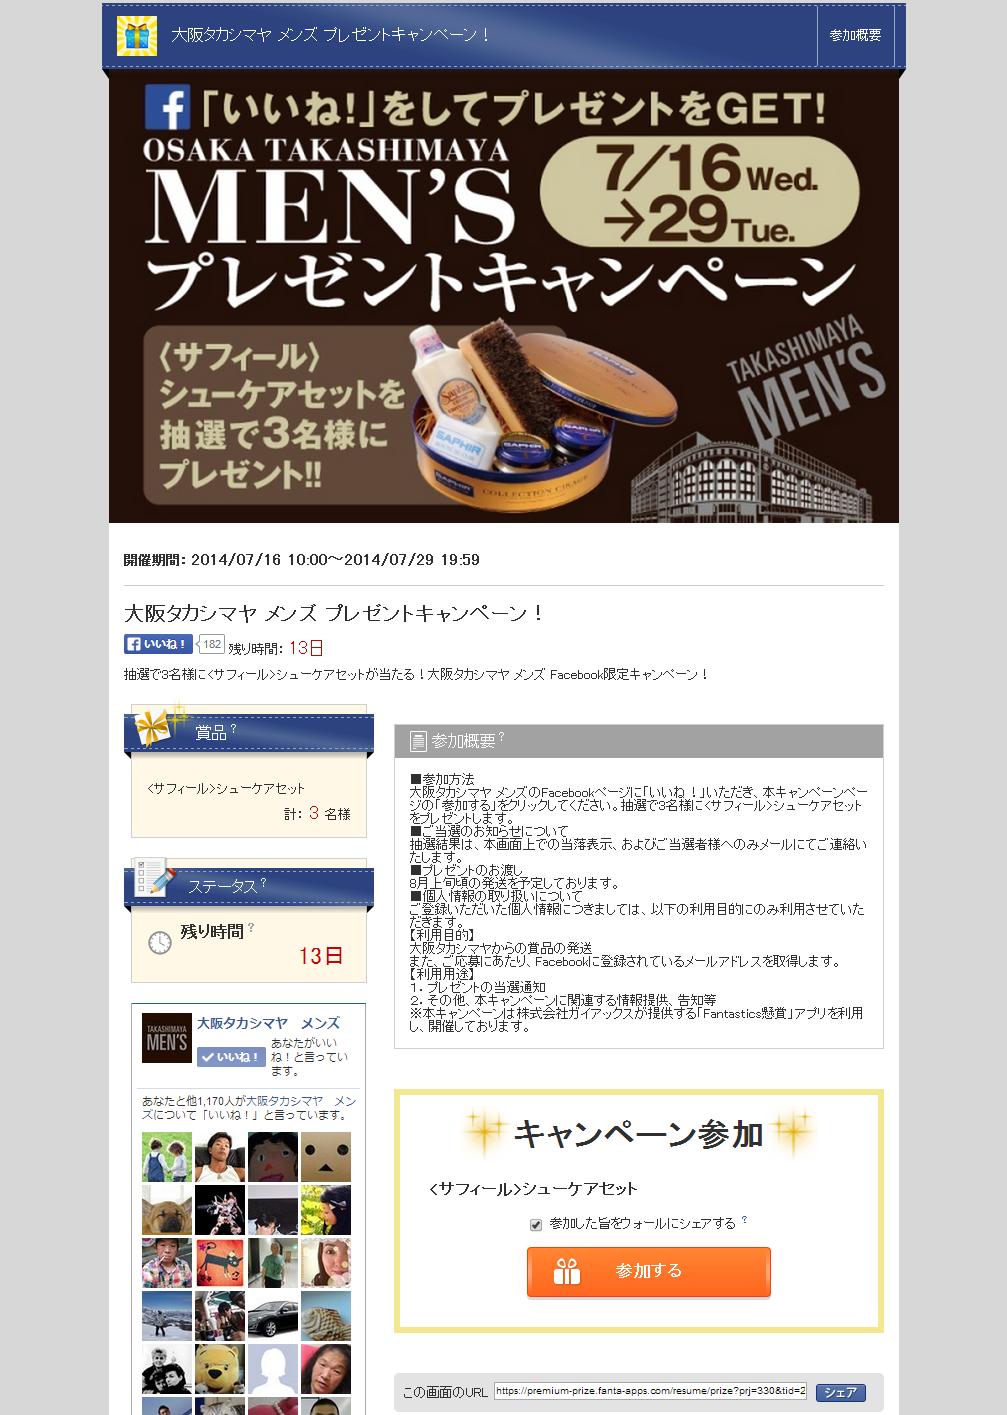 Fantastics 懸賞キャンペーンアプリ(株式会社高島屋様)